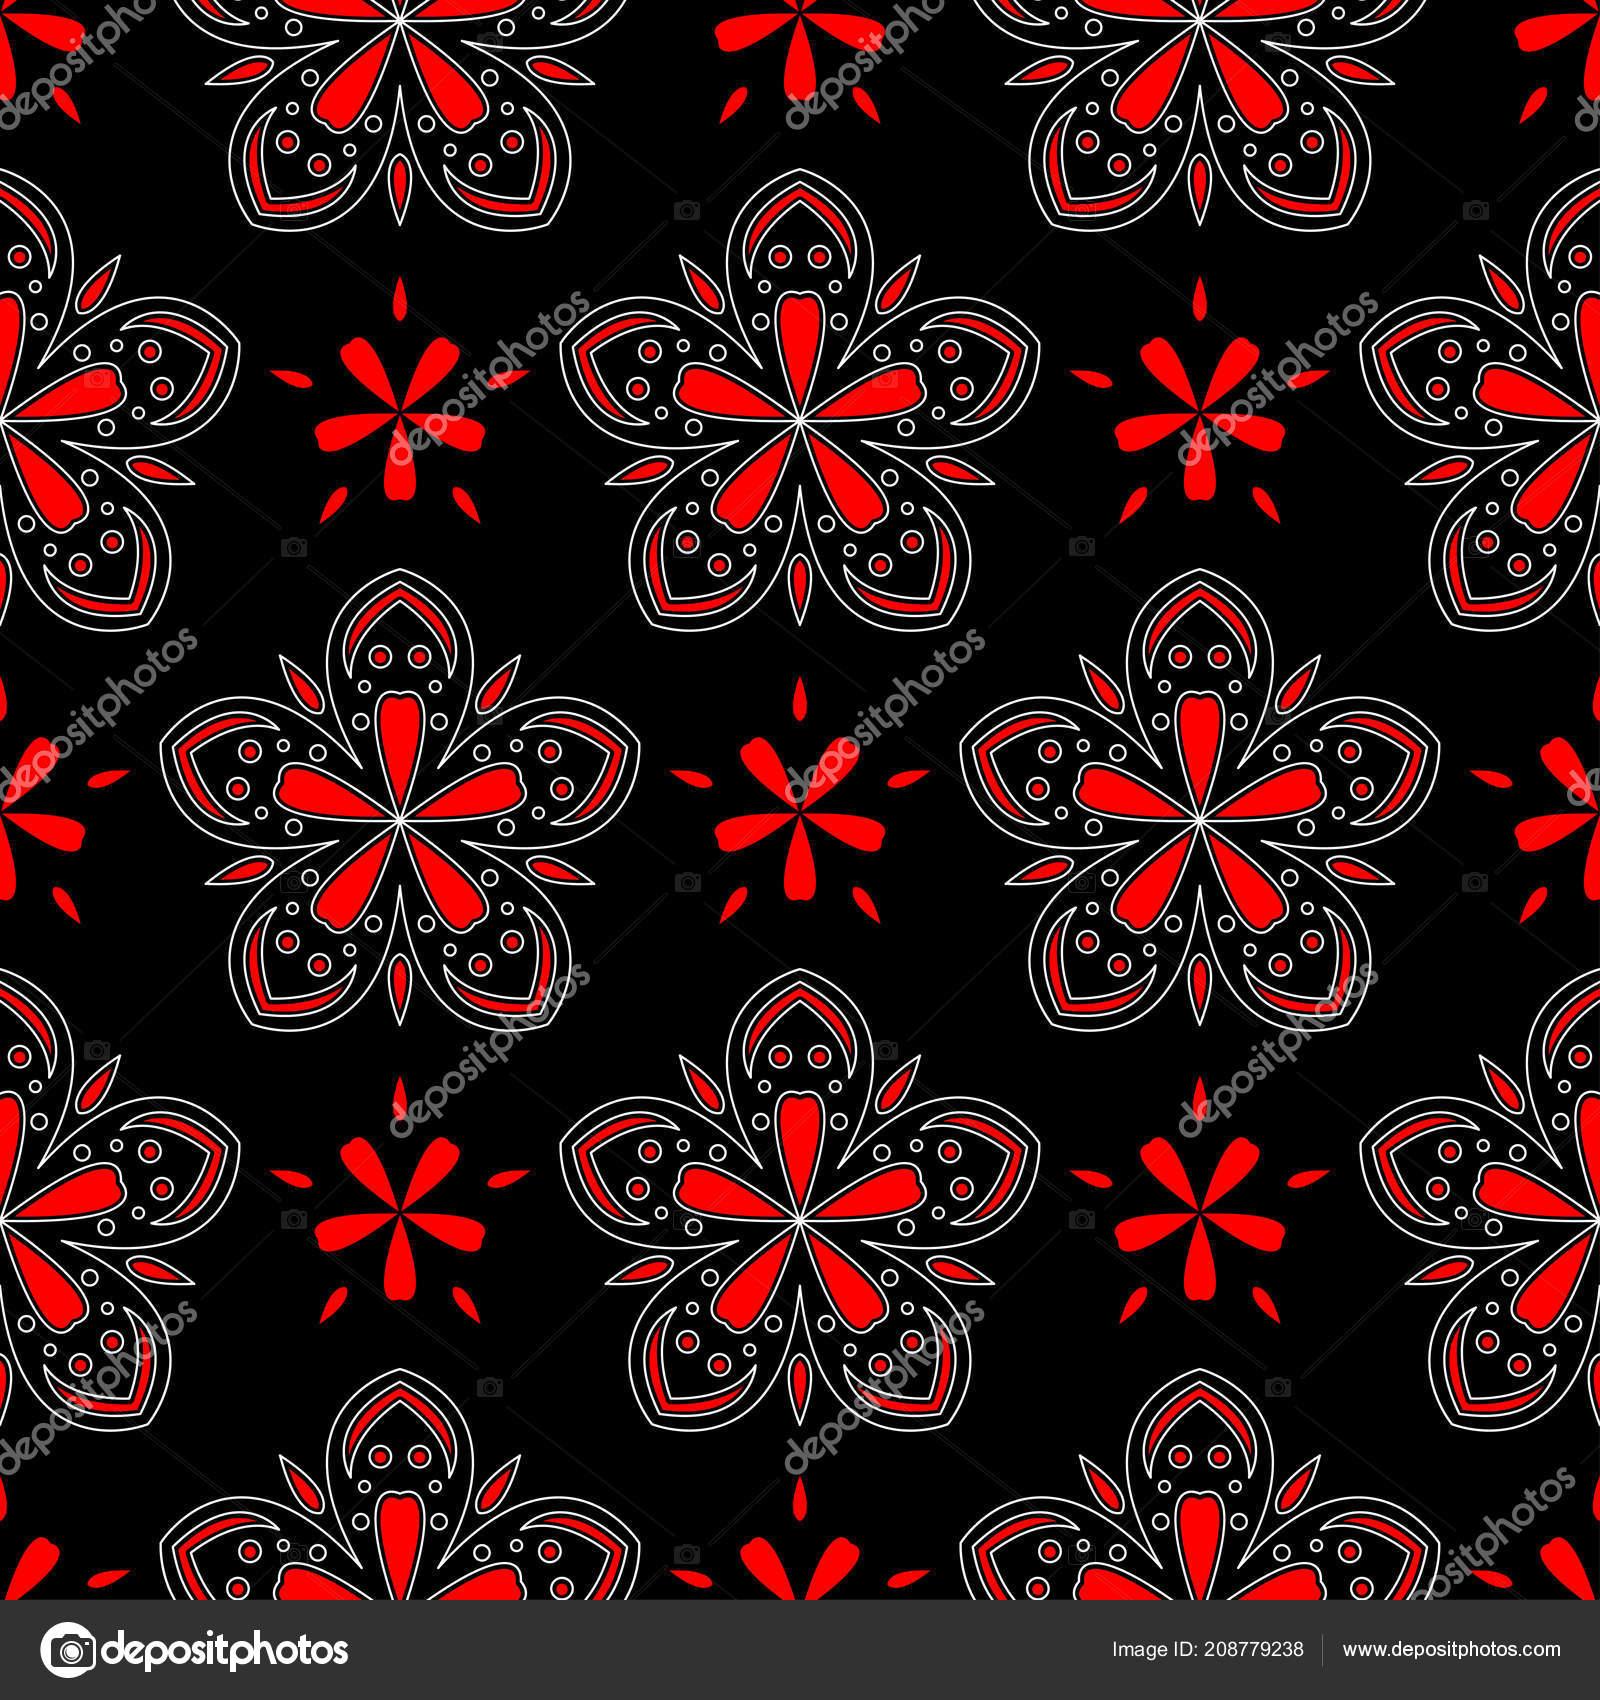 Black Red White Floral Seamless Pattern Wallpaper Textile Fabrics